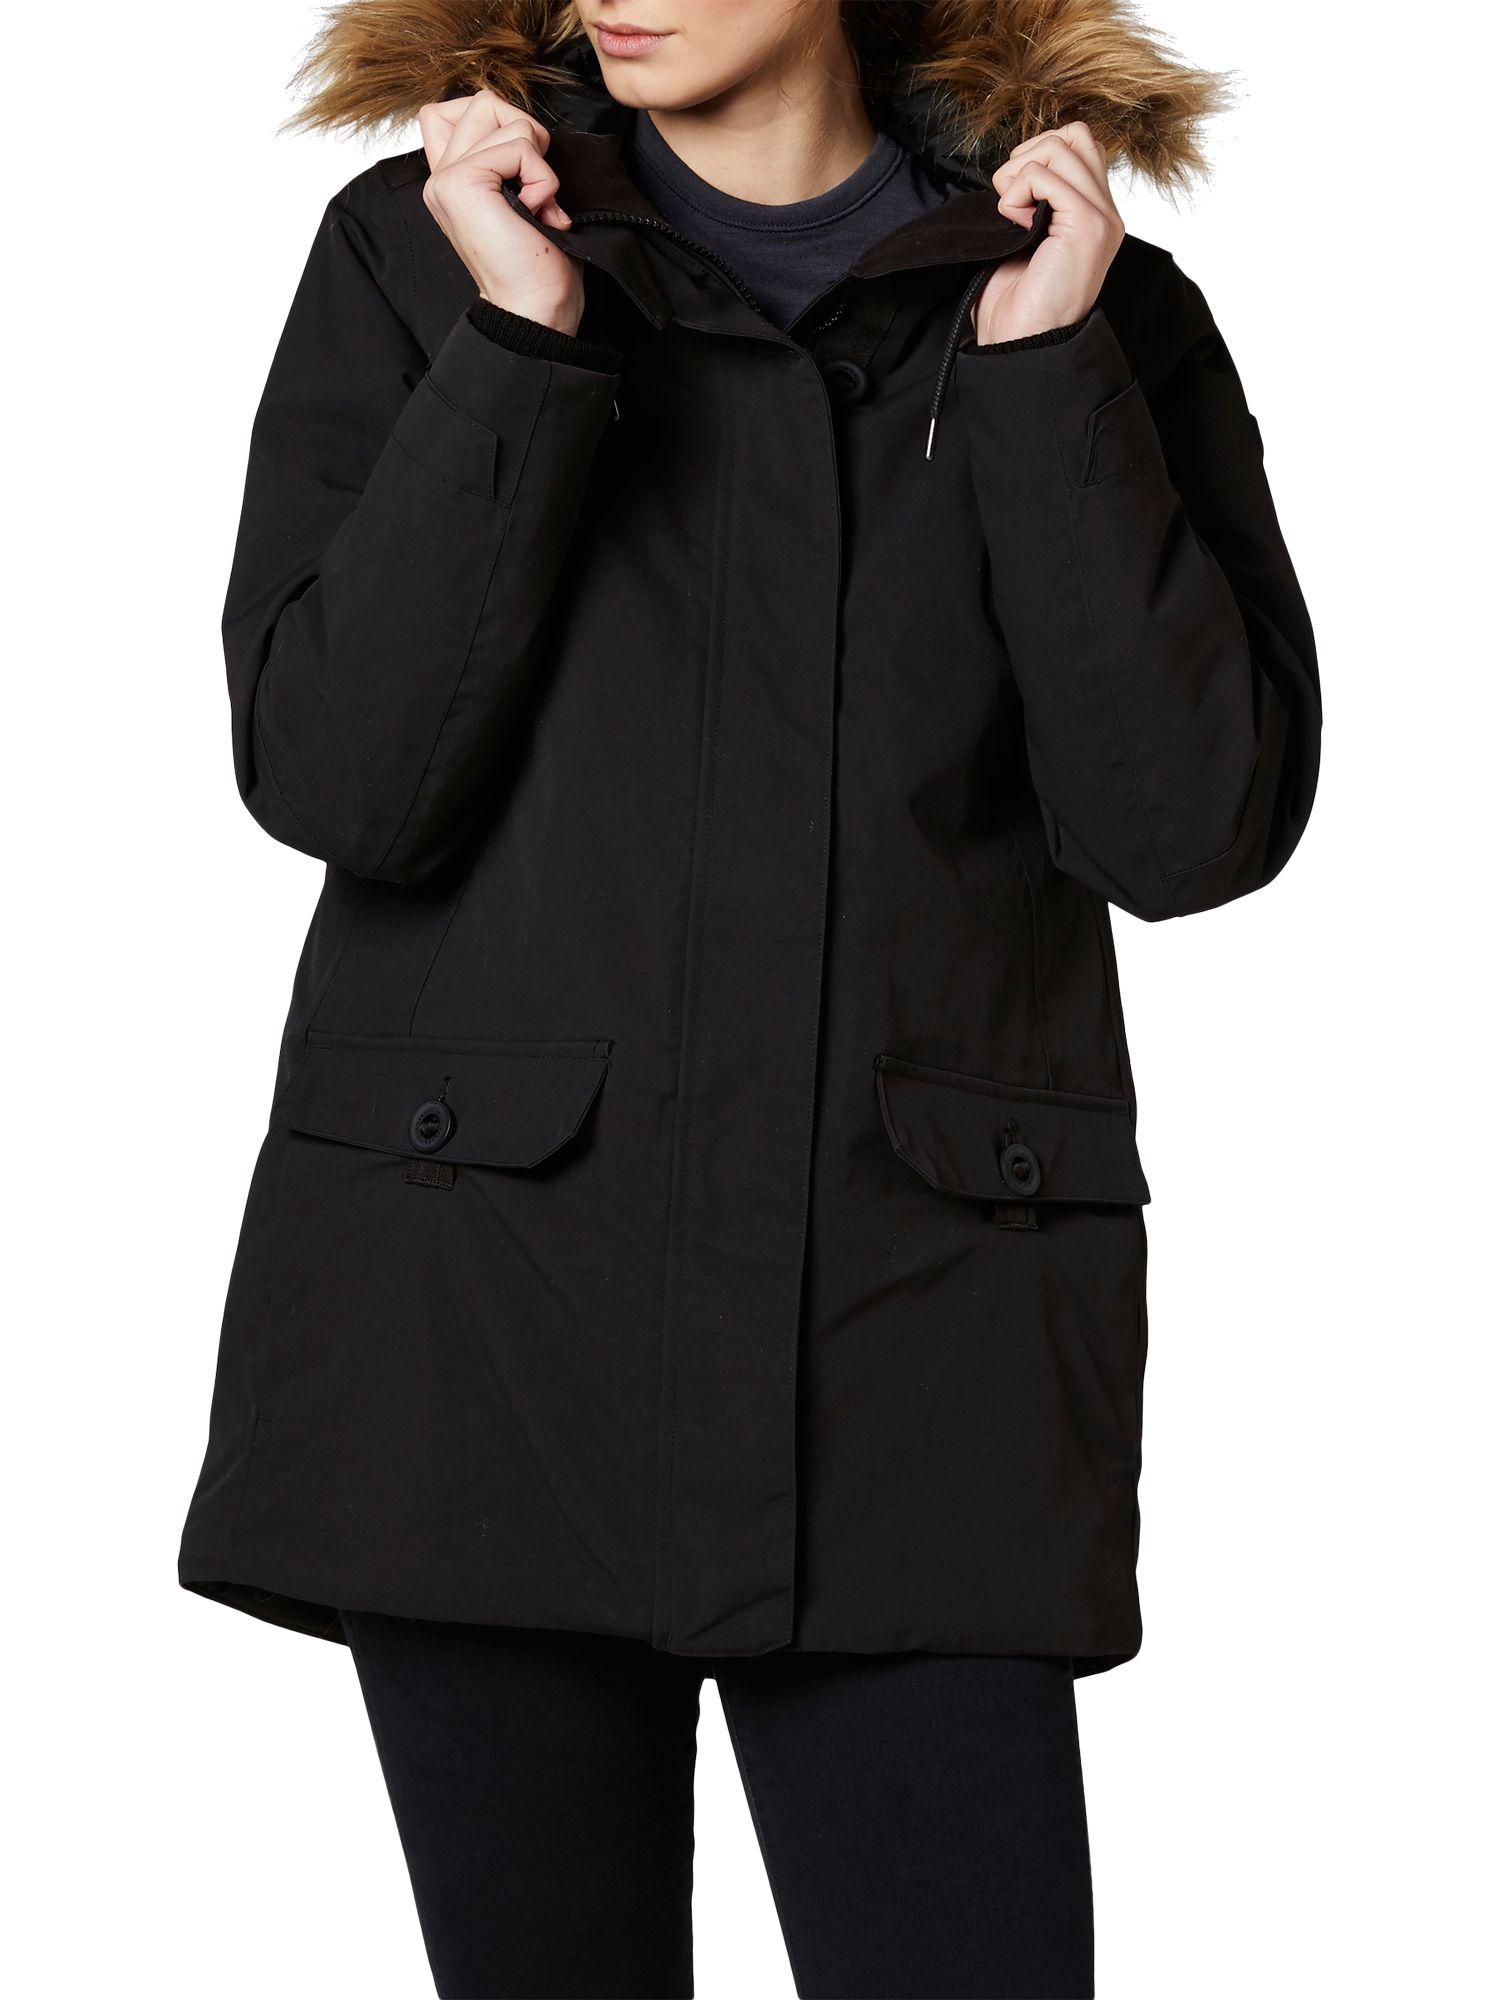 Helly Hansen Helly Hansen Svalbard Women's Parka Jacket, Black